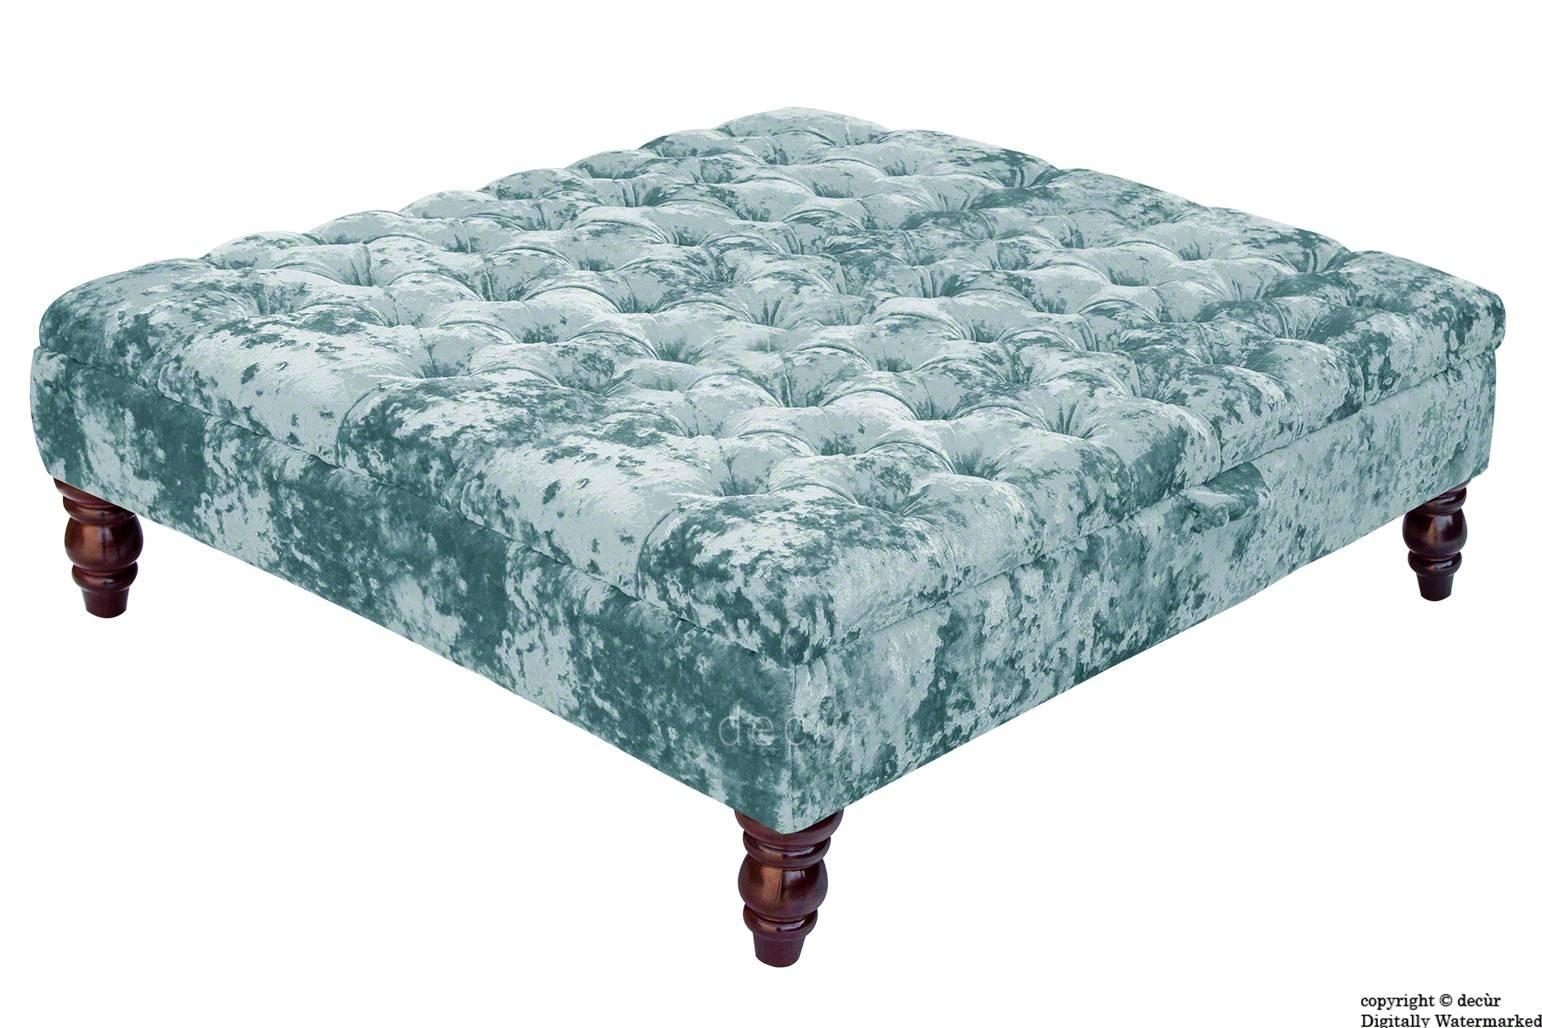 Bespoke Designer Sofas, Footstools, Bespoke Footstools, Bespoke regarding Velvet Footstool (Image 7 of 30)